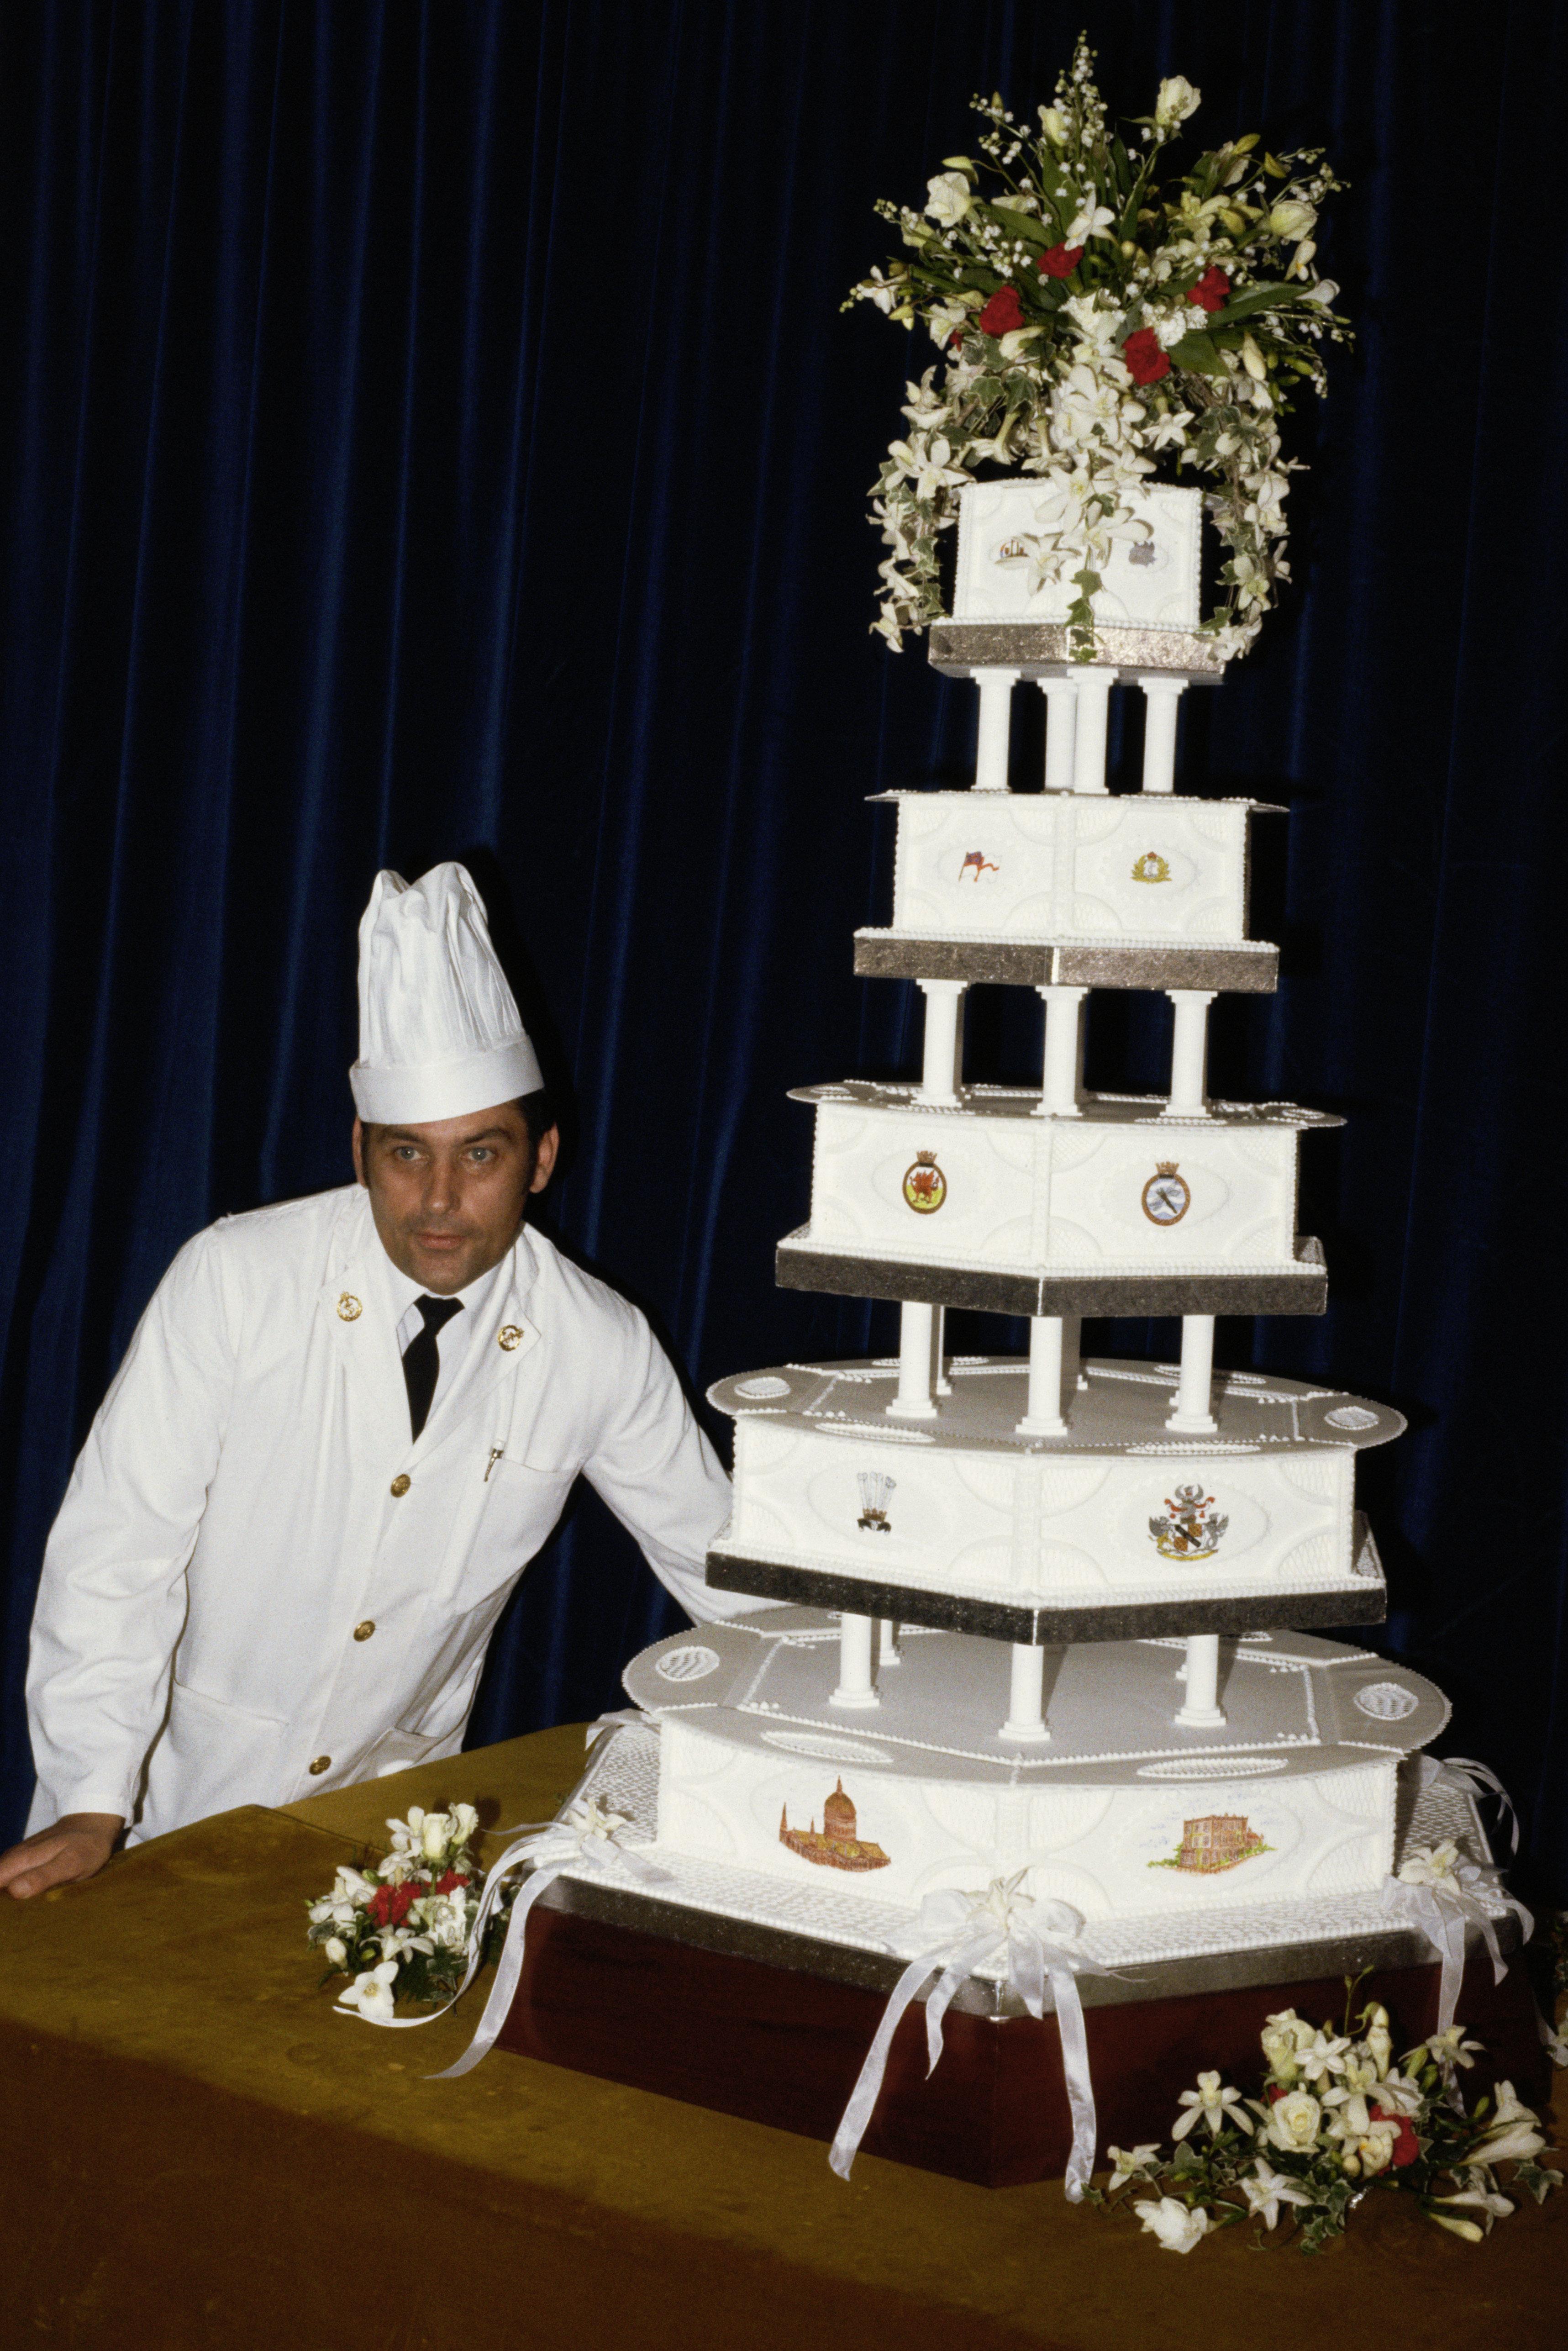 David Avery, pastelero jefe de la Royal Naval Cooking School, muestra la tarta de fruta de la boda de...